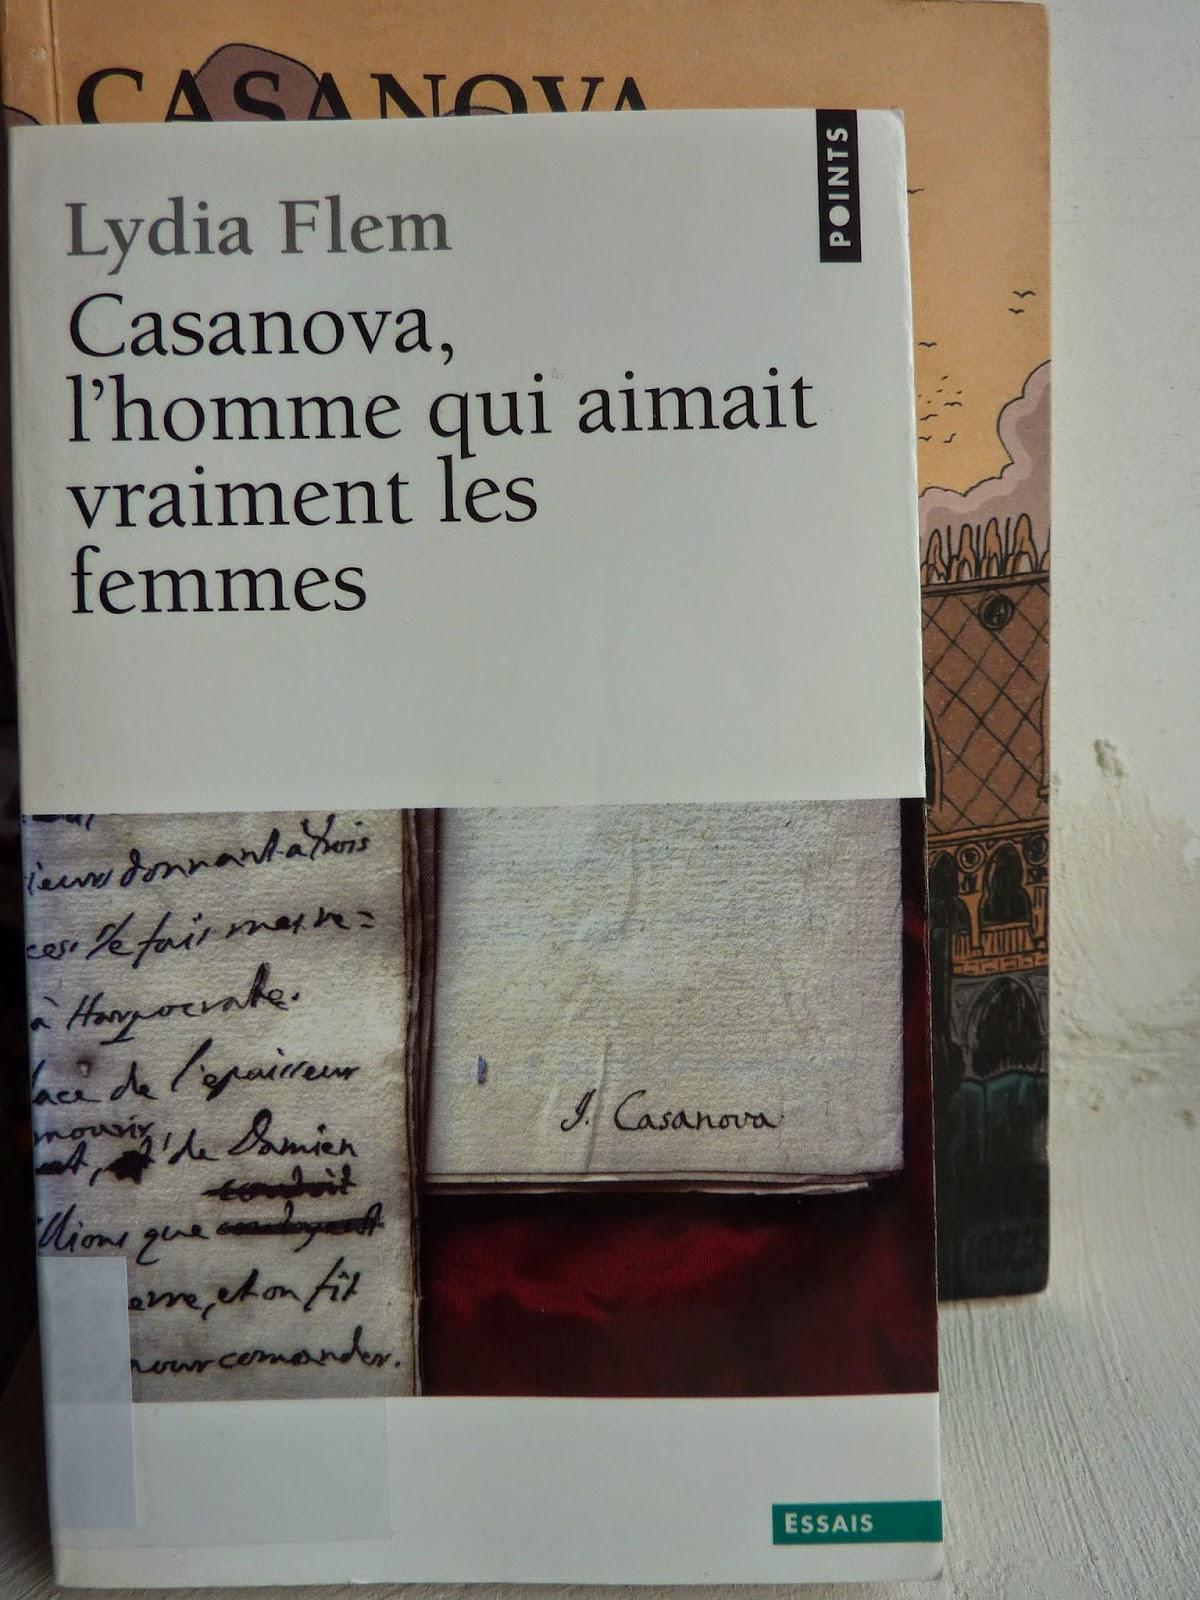 Casanova - Lydia Flem